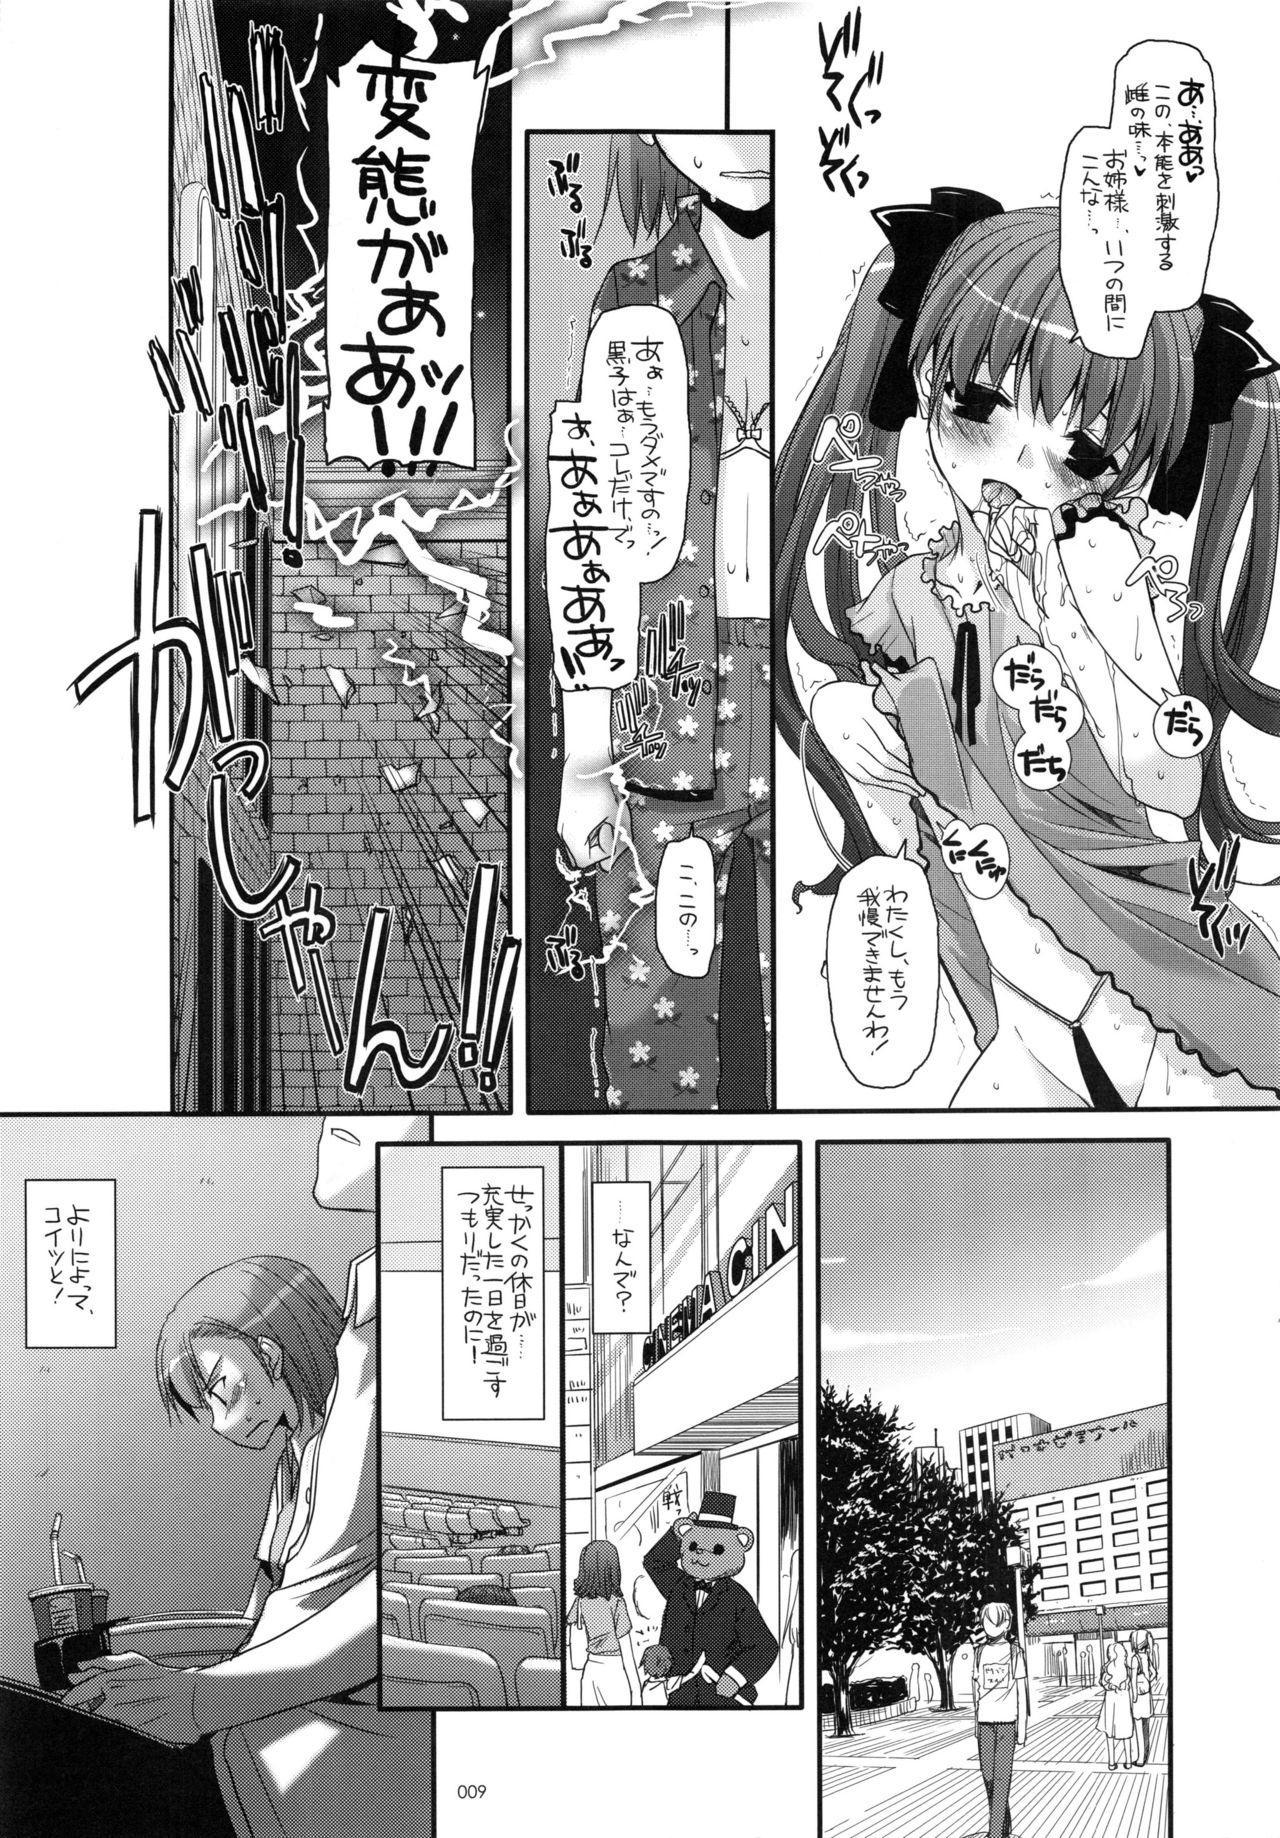 DL - Toaru Soushuuhen 7